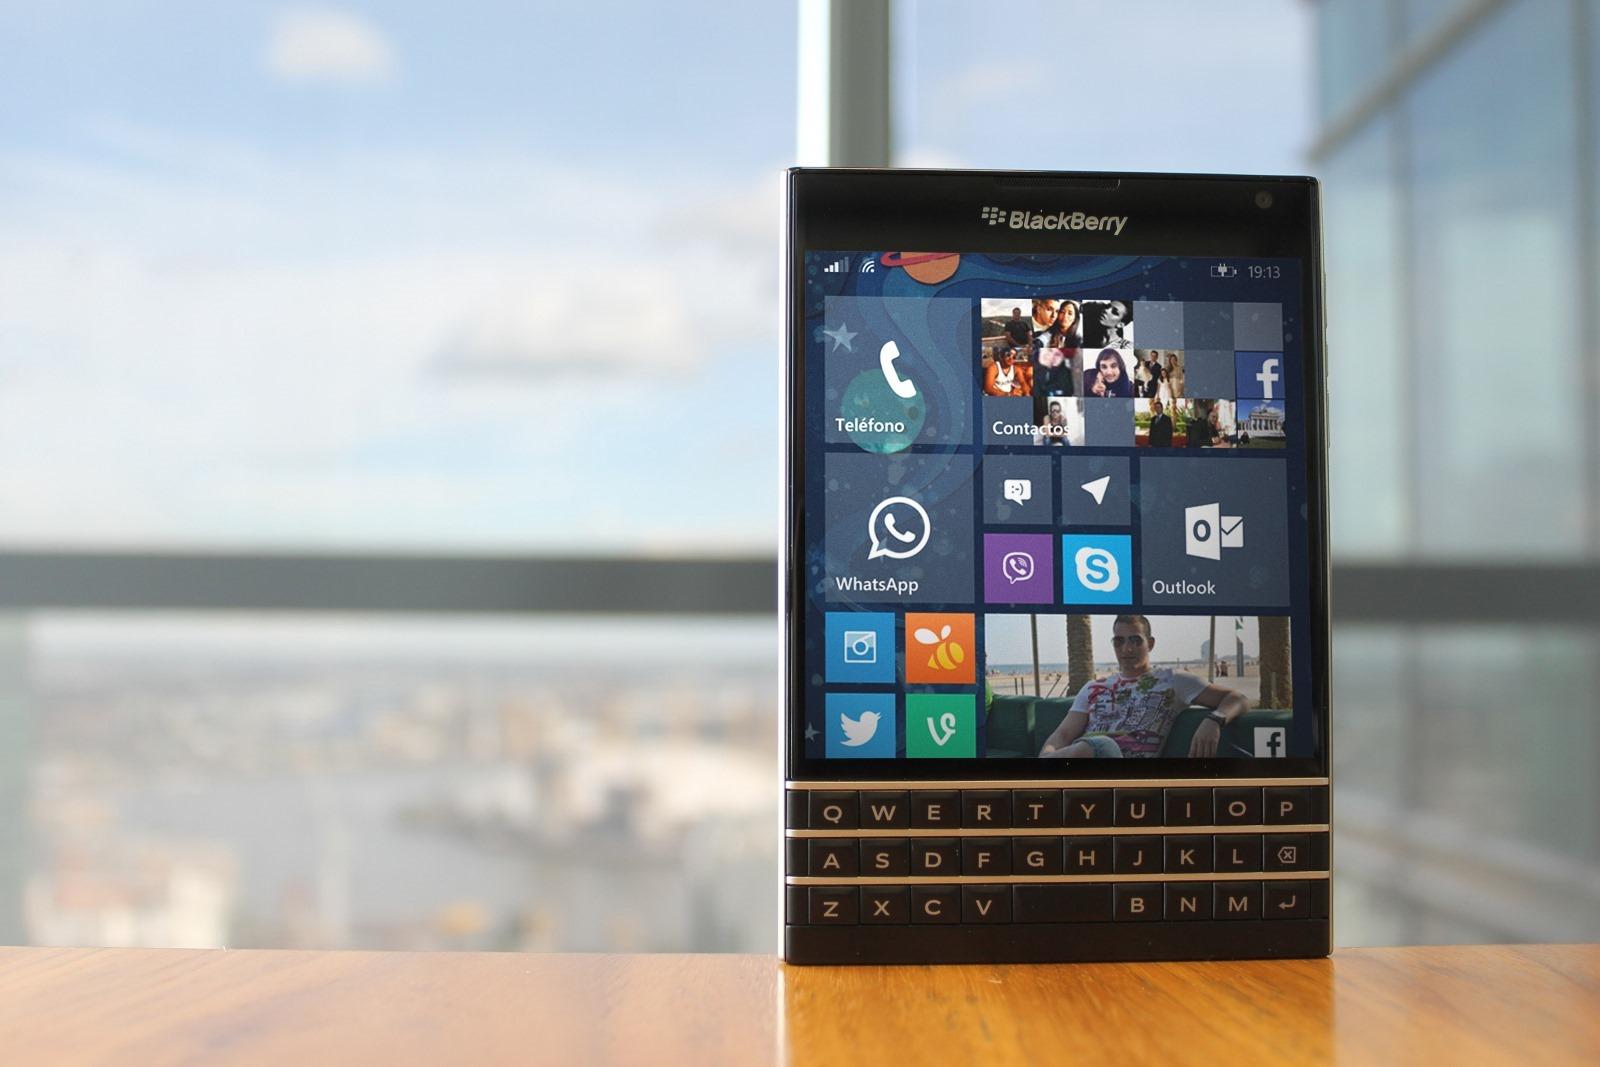 Blackberry Passport Windows 10 Mobile